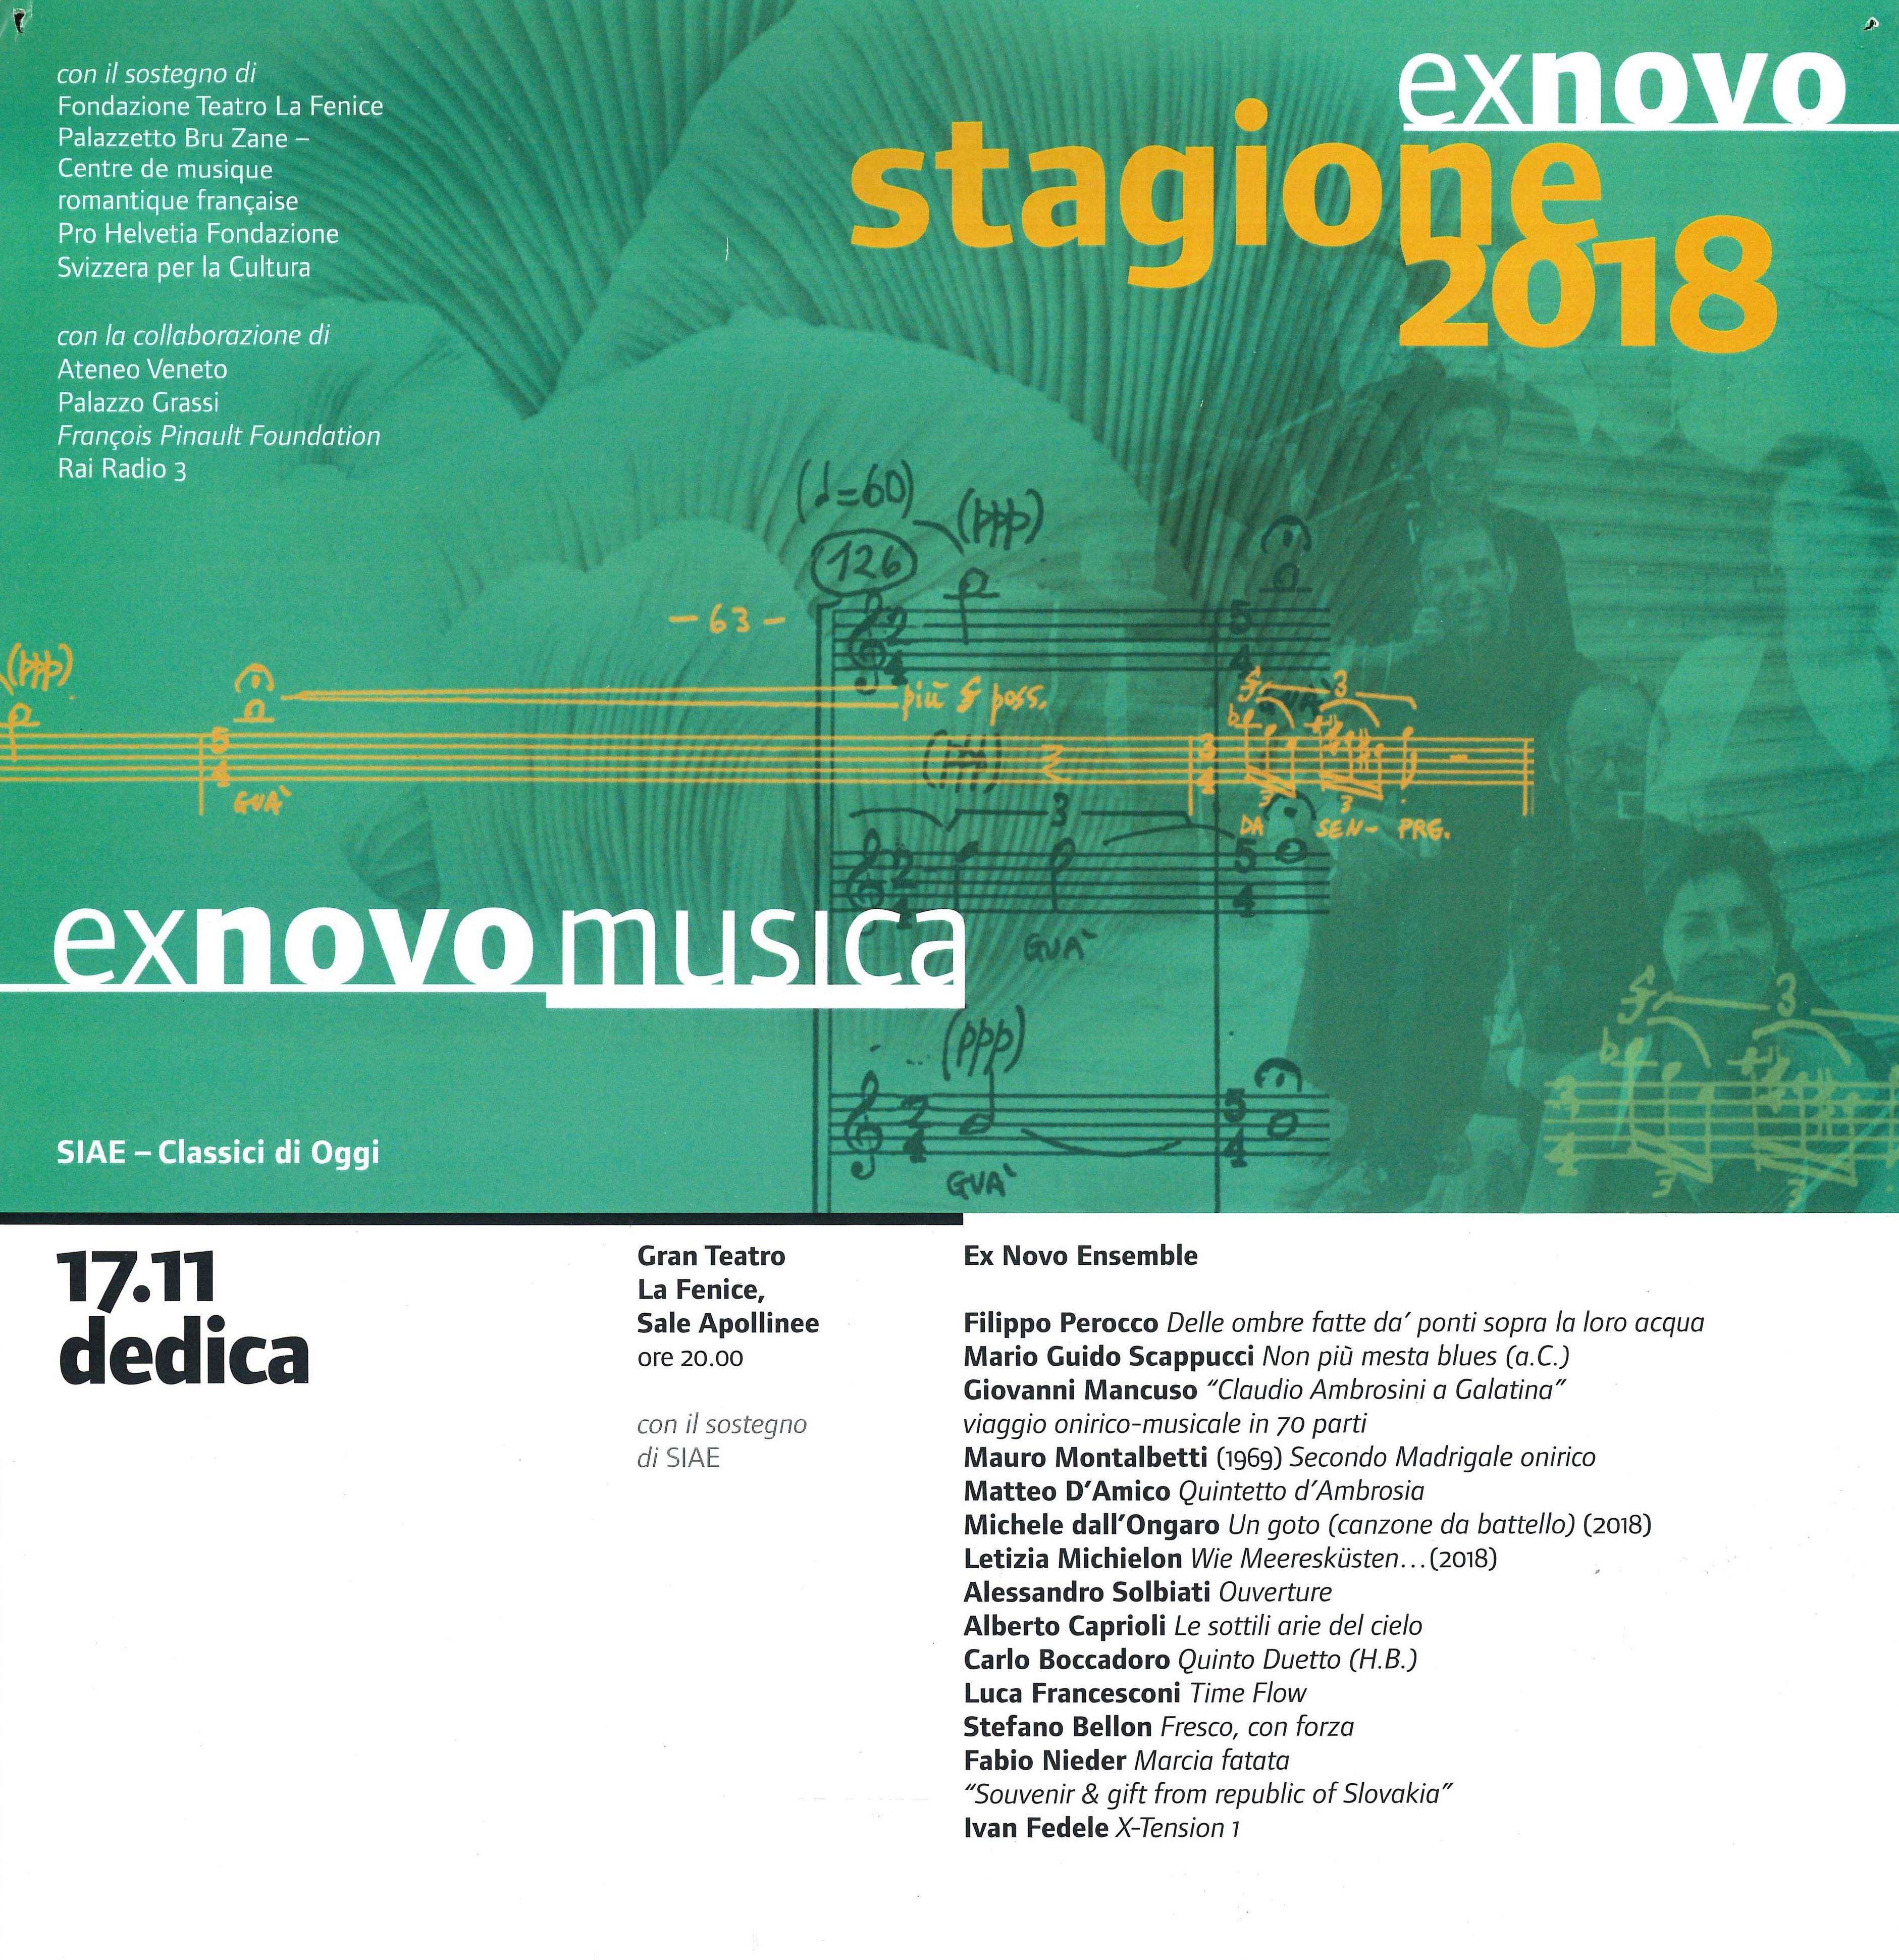 EX NOVO MUSICA 2018 - SALE APOLLINEE DEL GRAN TEATRO LA FENICE - CONCERTO-DEDICA A CLAUDIO AMBROSINI